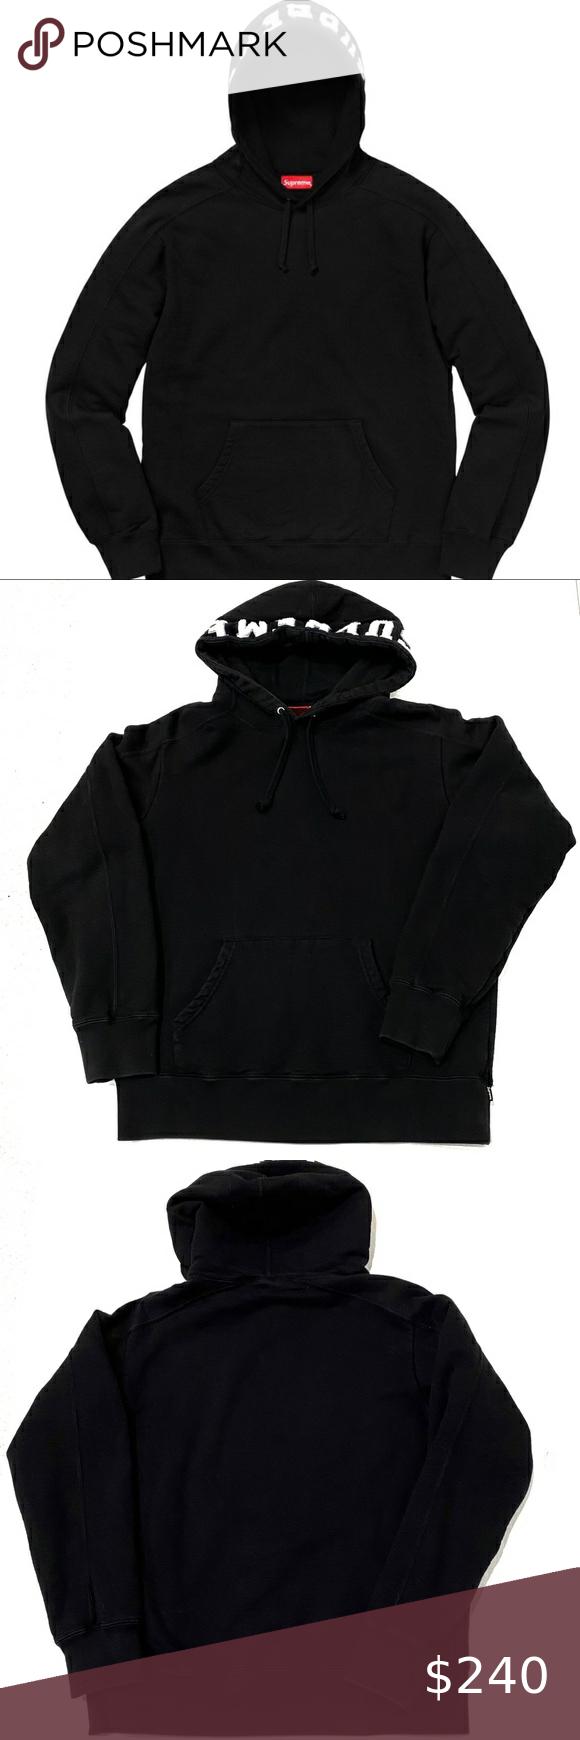 Supreme Paneled Hooded Sweatshirt Black Fw2018 Black Sweatshirts Hooded Sweatshirts Sweatshirts [ 1740 x 580 Pixel ]